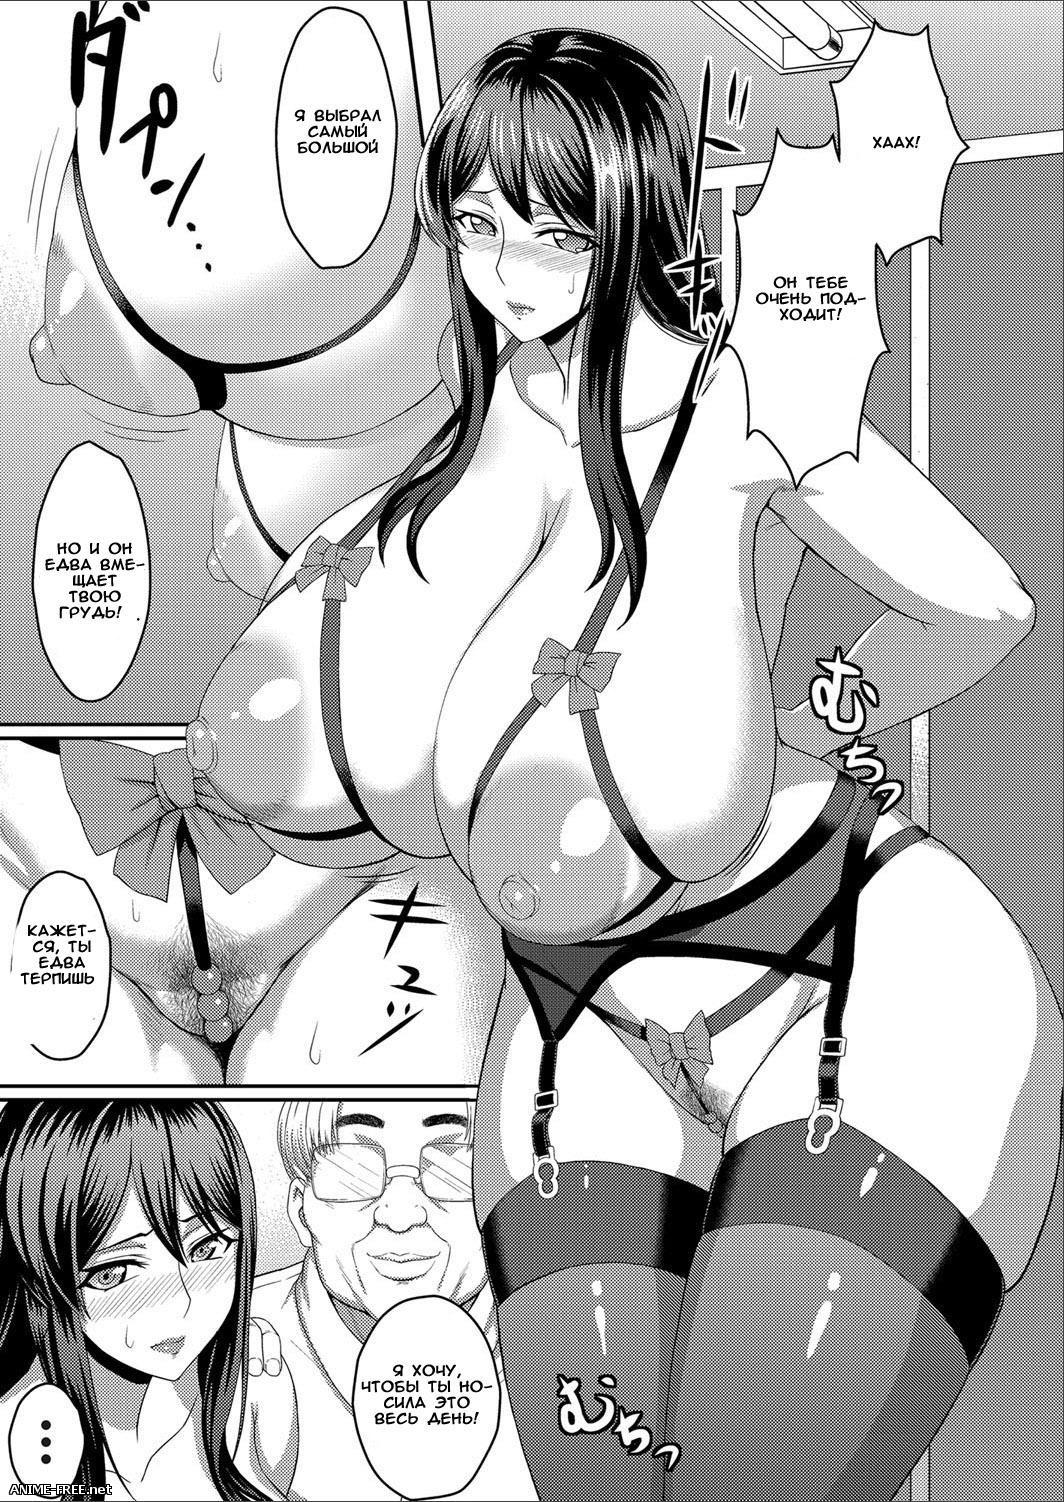 Kuroharuto (Collection) - Сборник хентай манги [Cen] [RUS,ENG] Manga Hentai